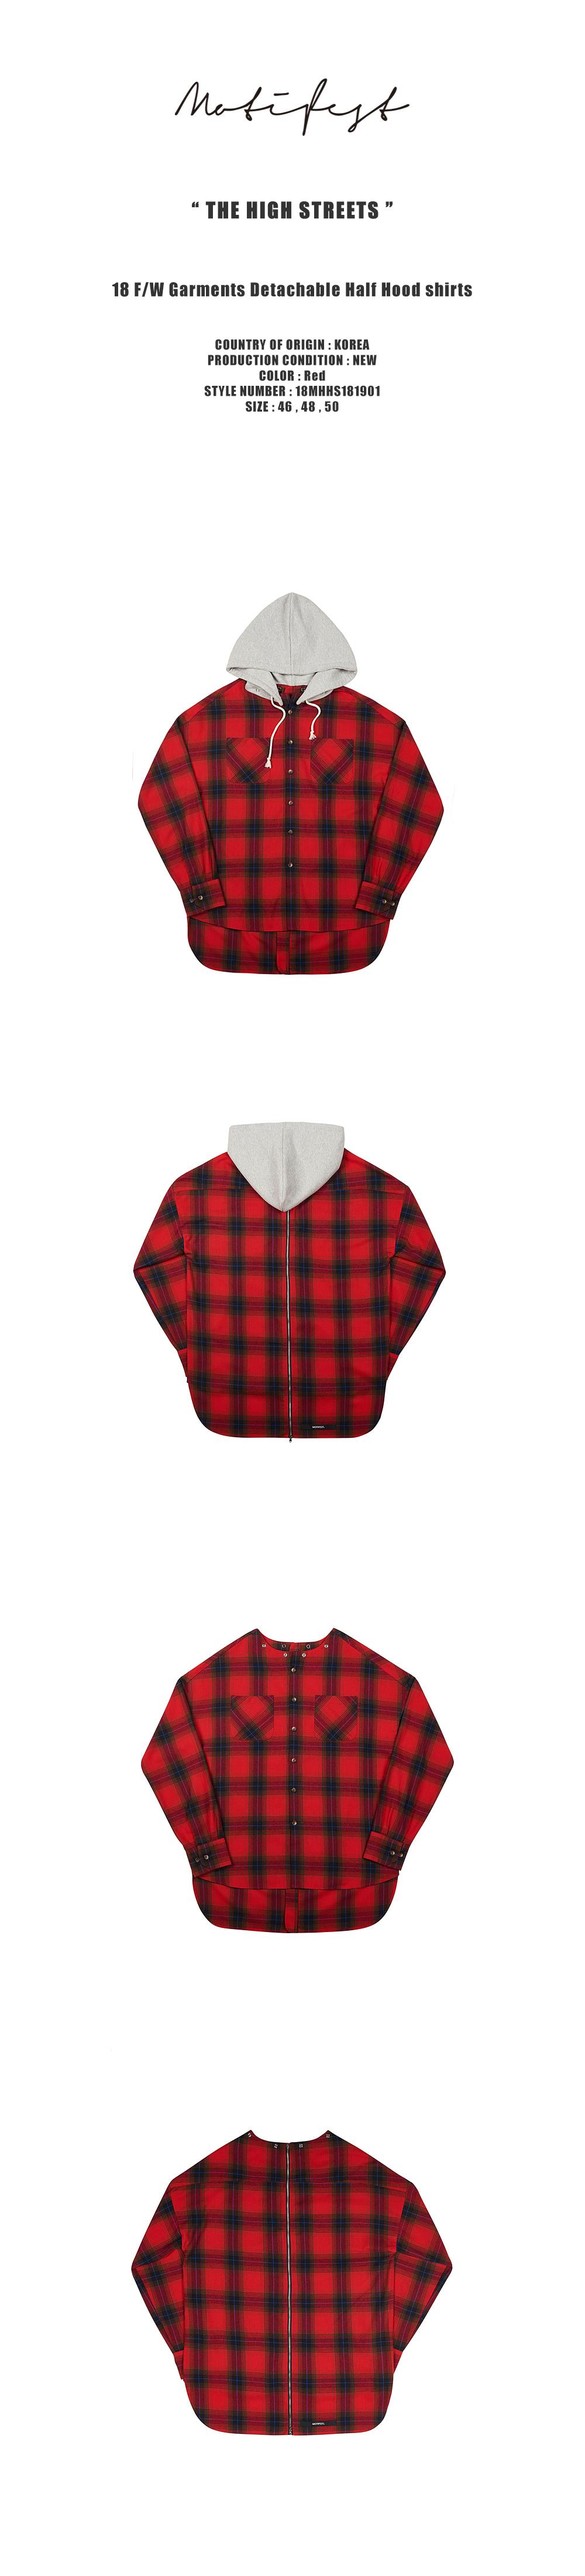 Garments-Detachable-Half-Hood-Shirts-Red--detail 1000.jpg